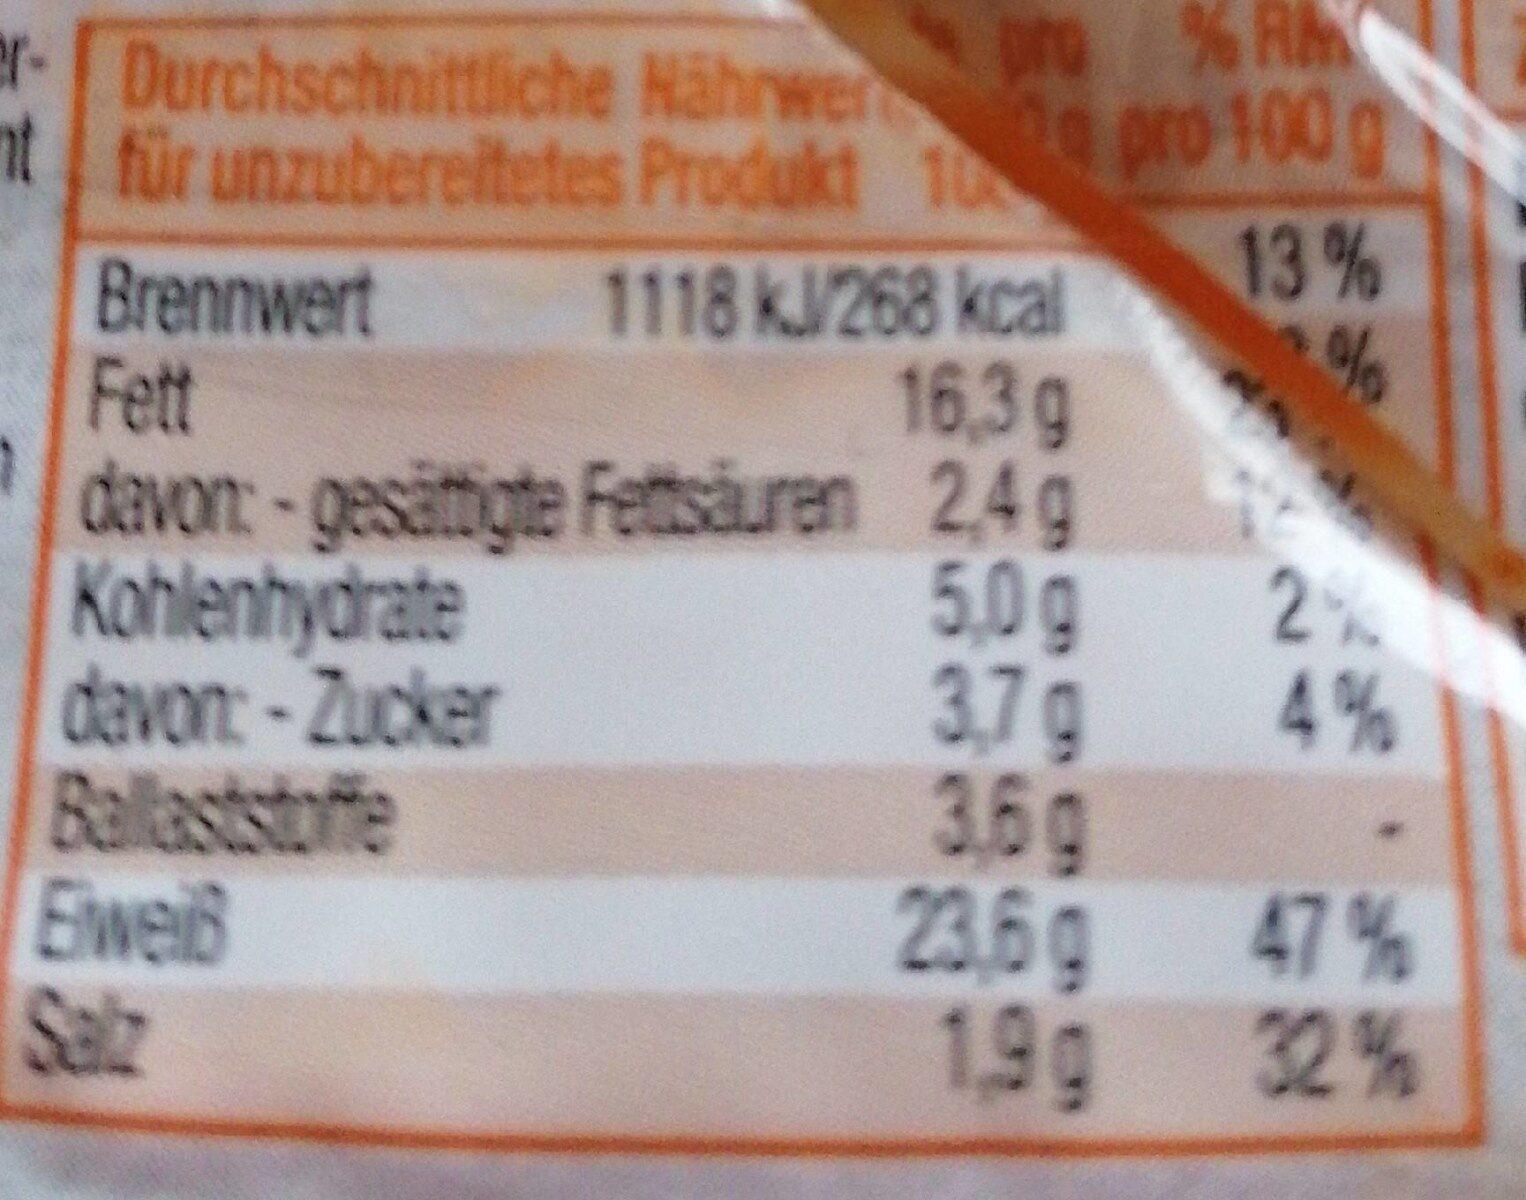 Vegane Tofu bratstreifen - Informations nutritionnelles - de